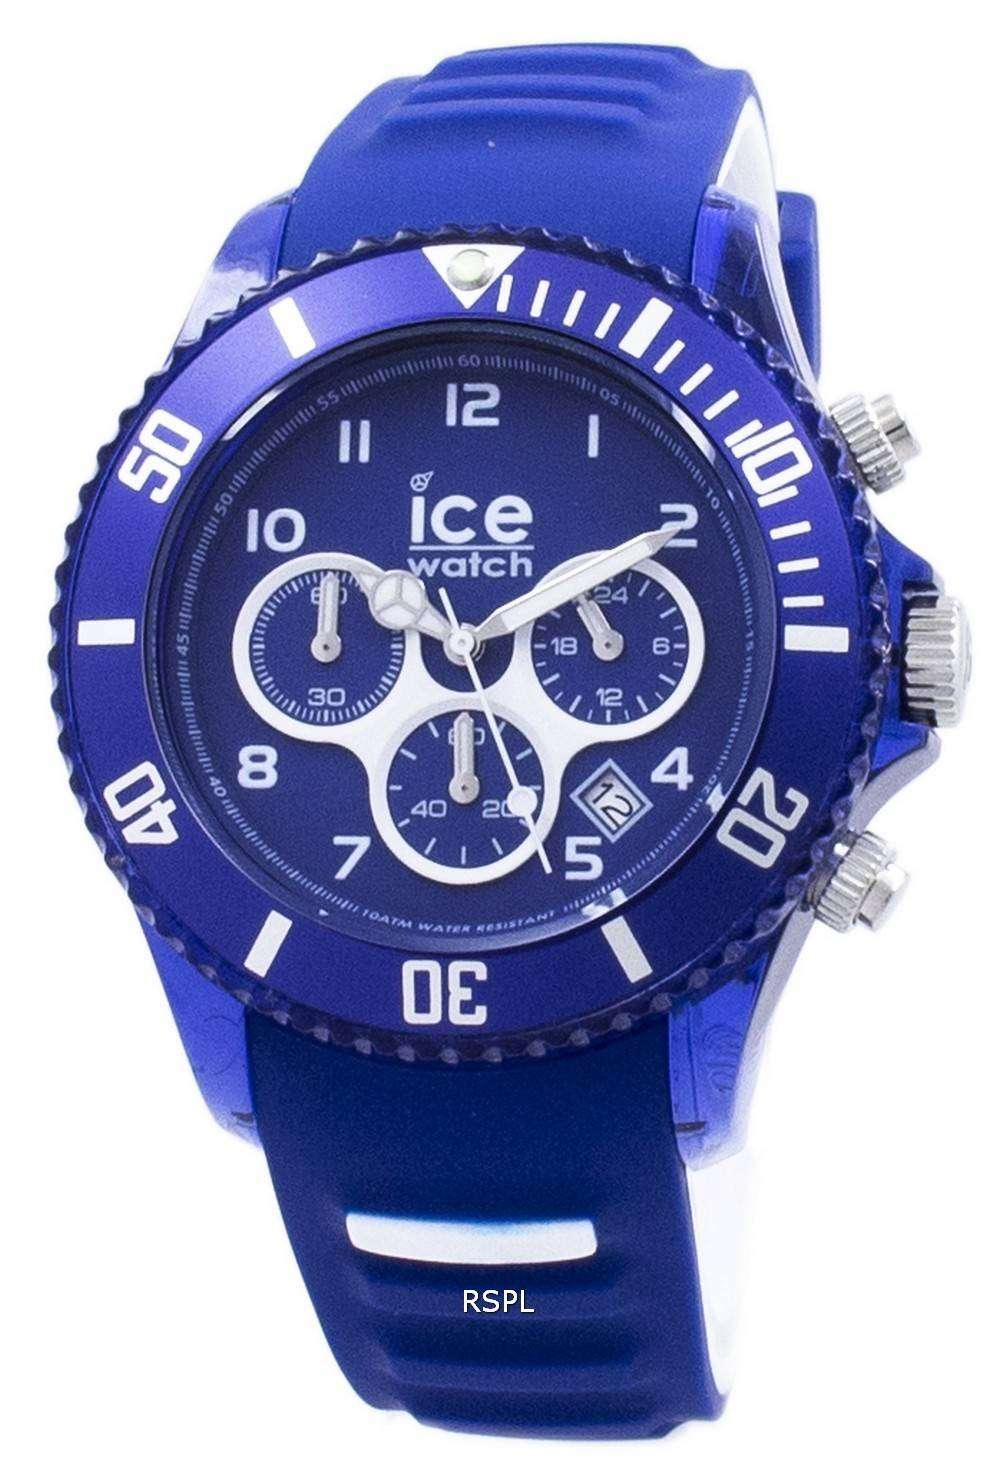 Ice aqua marine large chronograph quartz 012734 men 39 s watch for Aqua marine watches